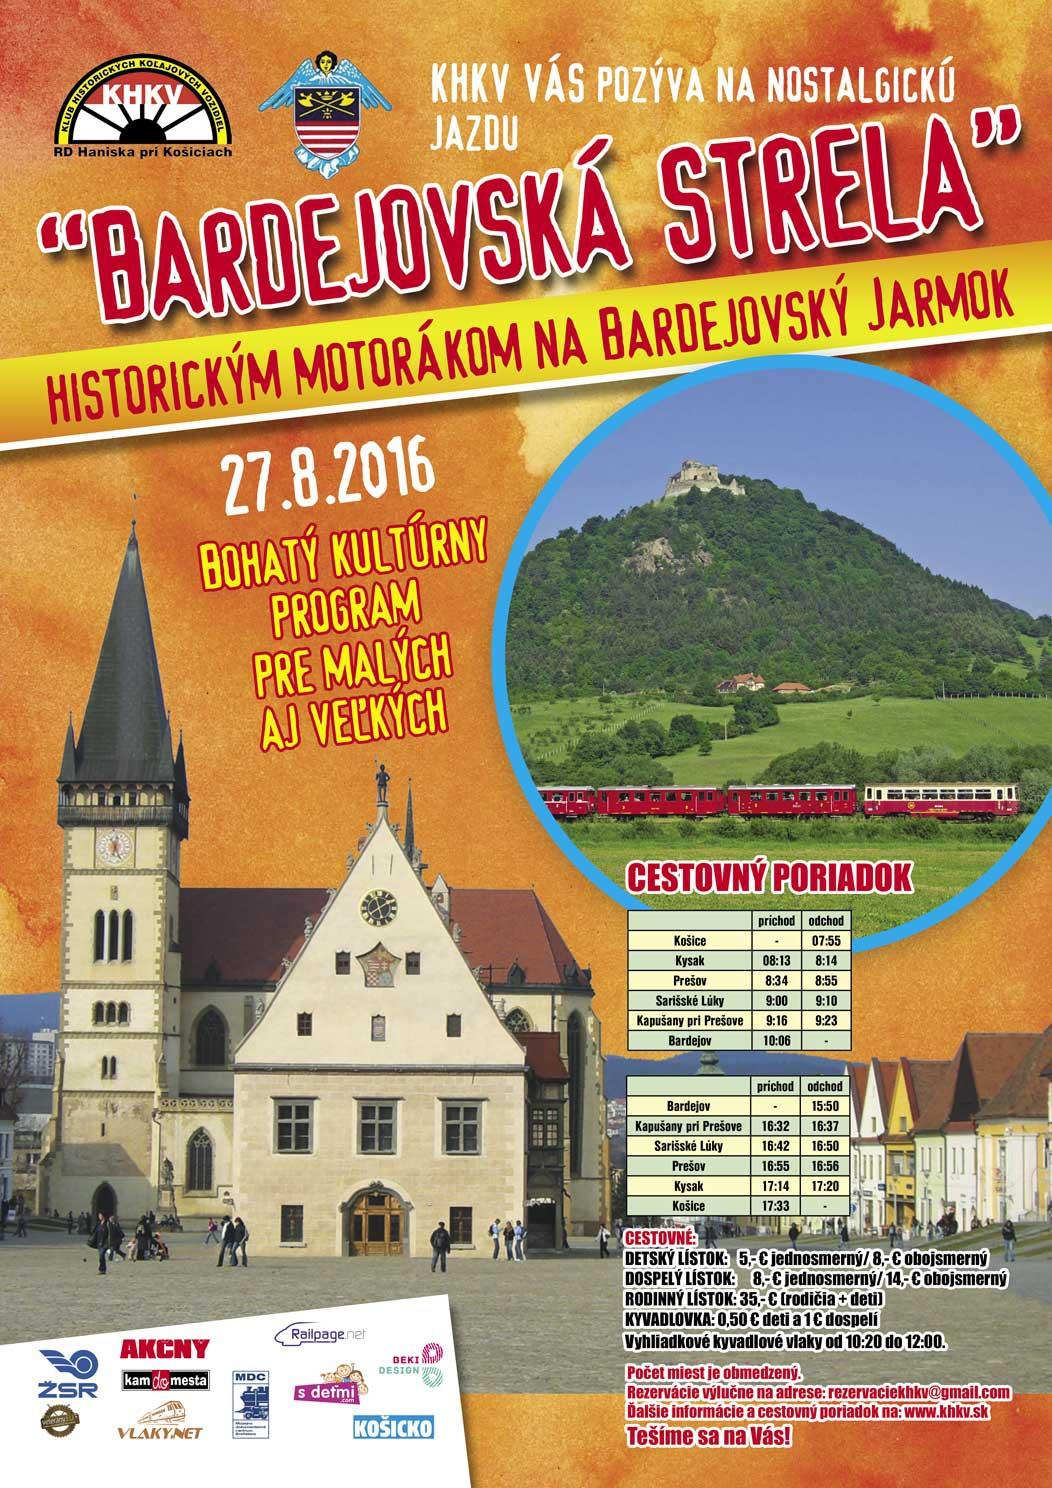 Bardejovska strela 2016